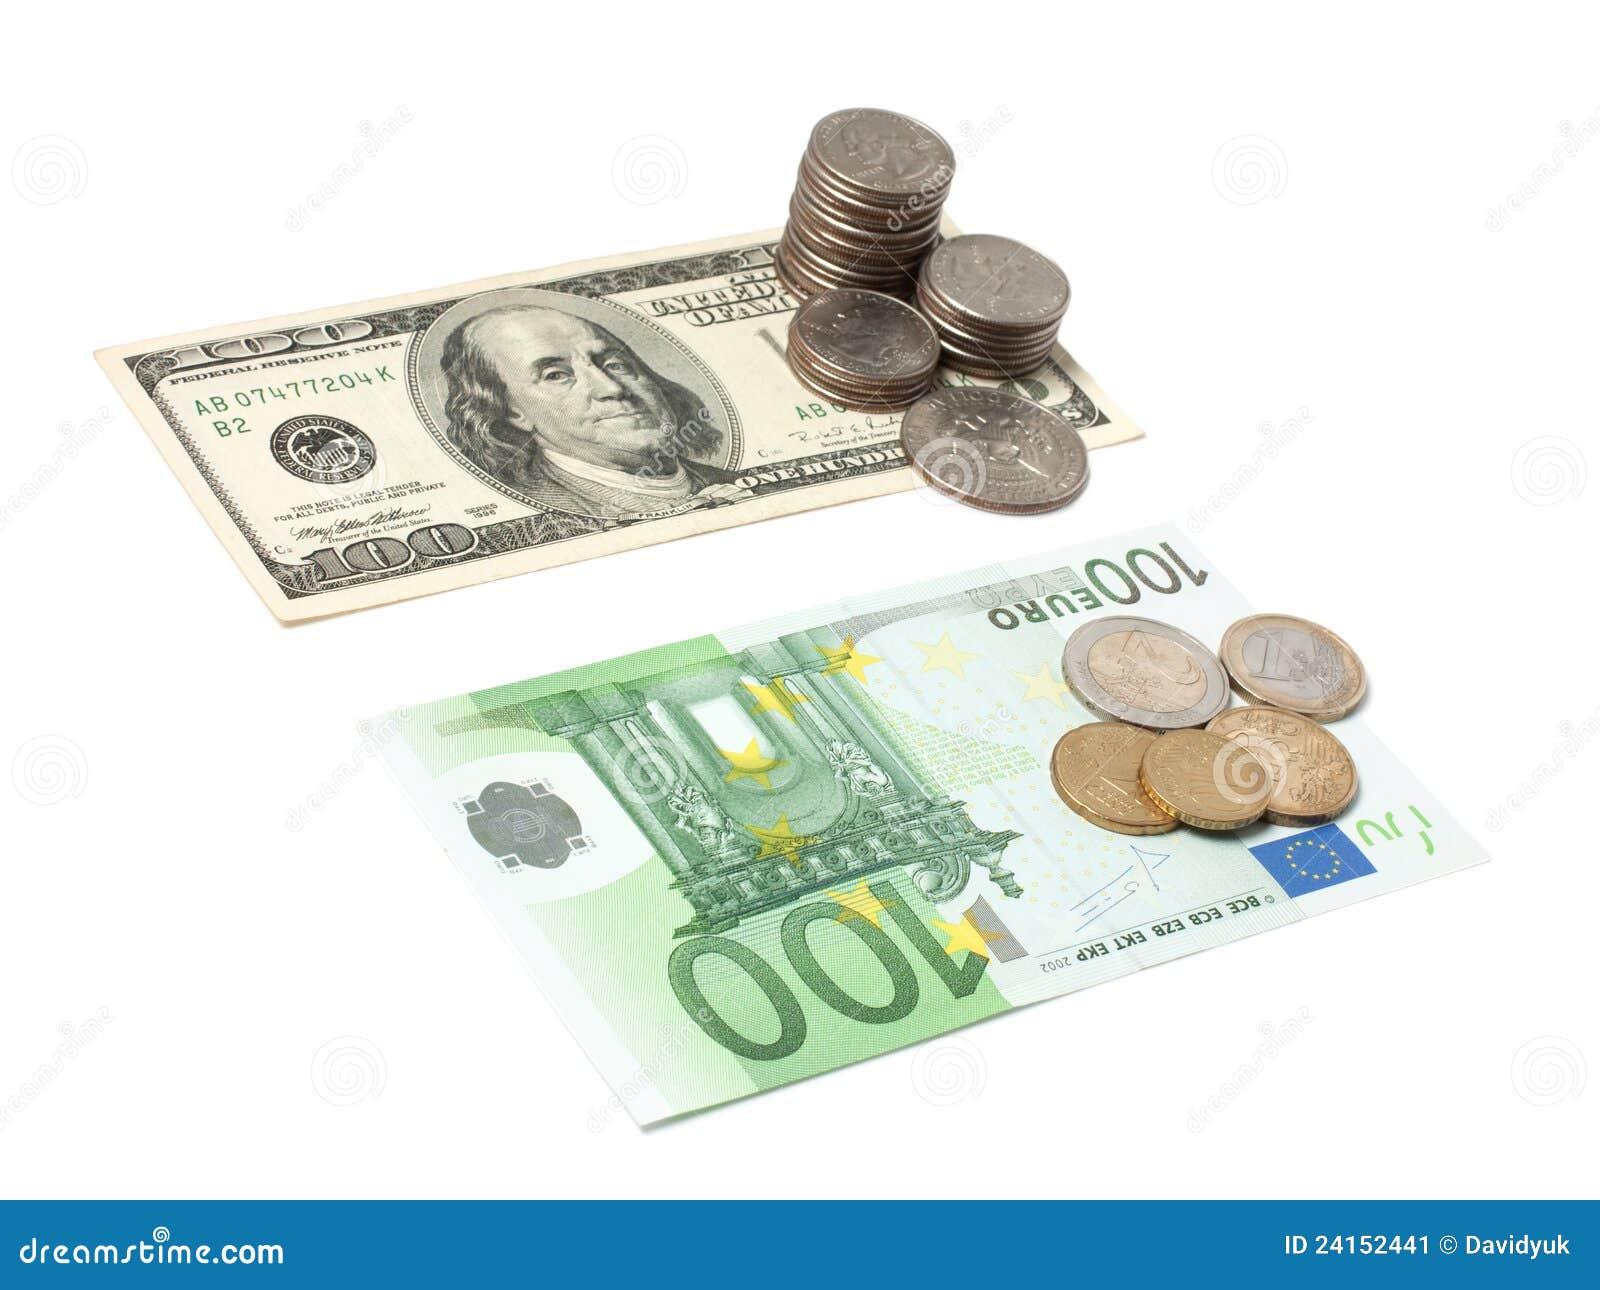 dollars and euros stock image image 24152441. Black Bedroom Furniture Sets. Home Design Ideas